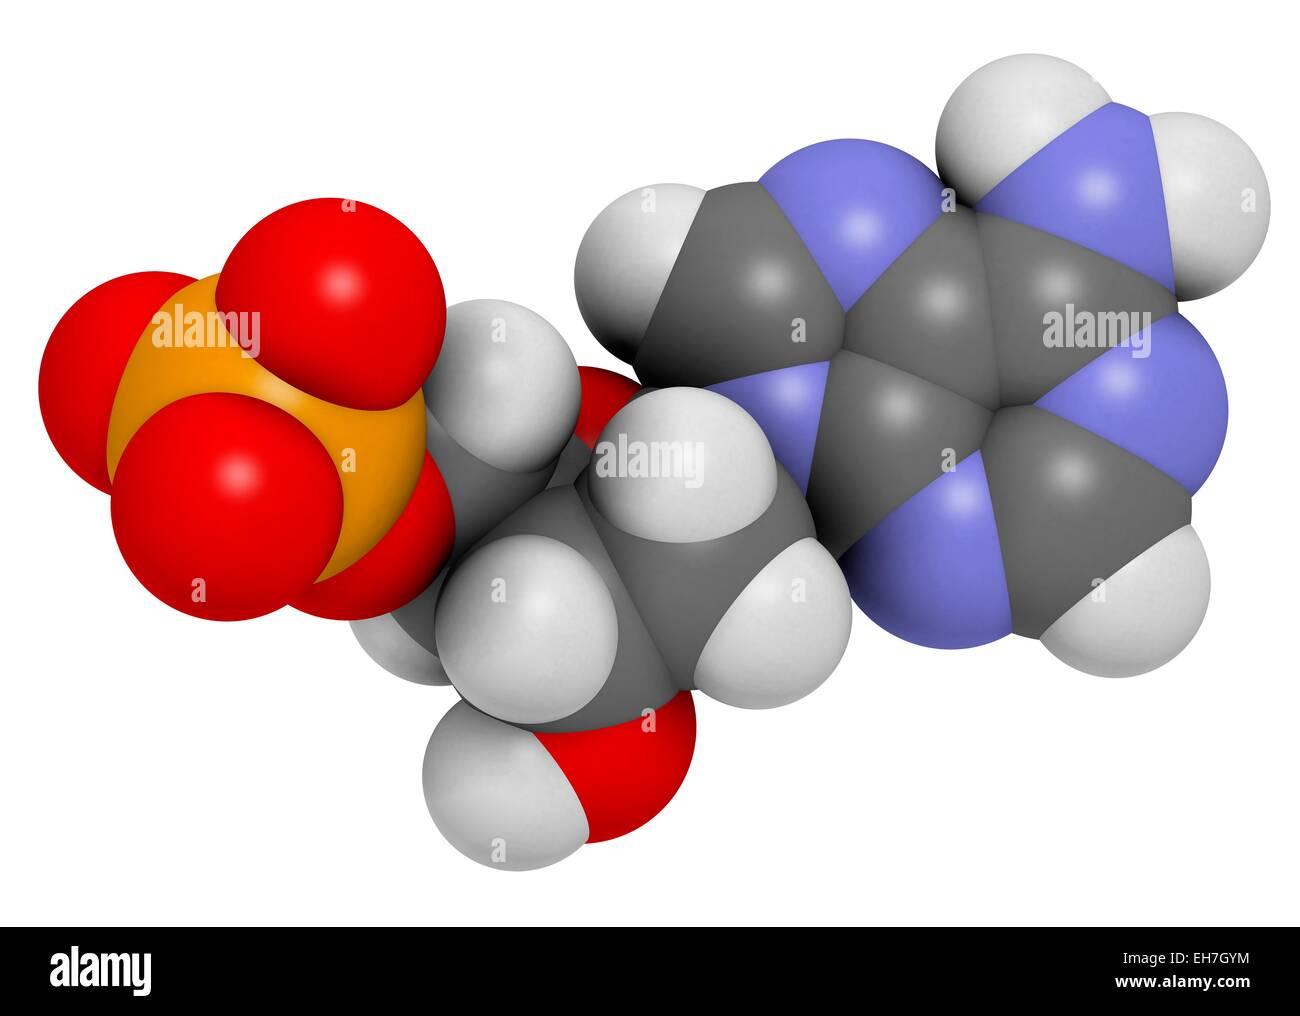 Deoxyadenosine monophosphate molecule - Stock Image